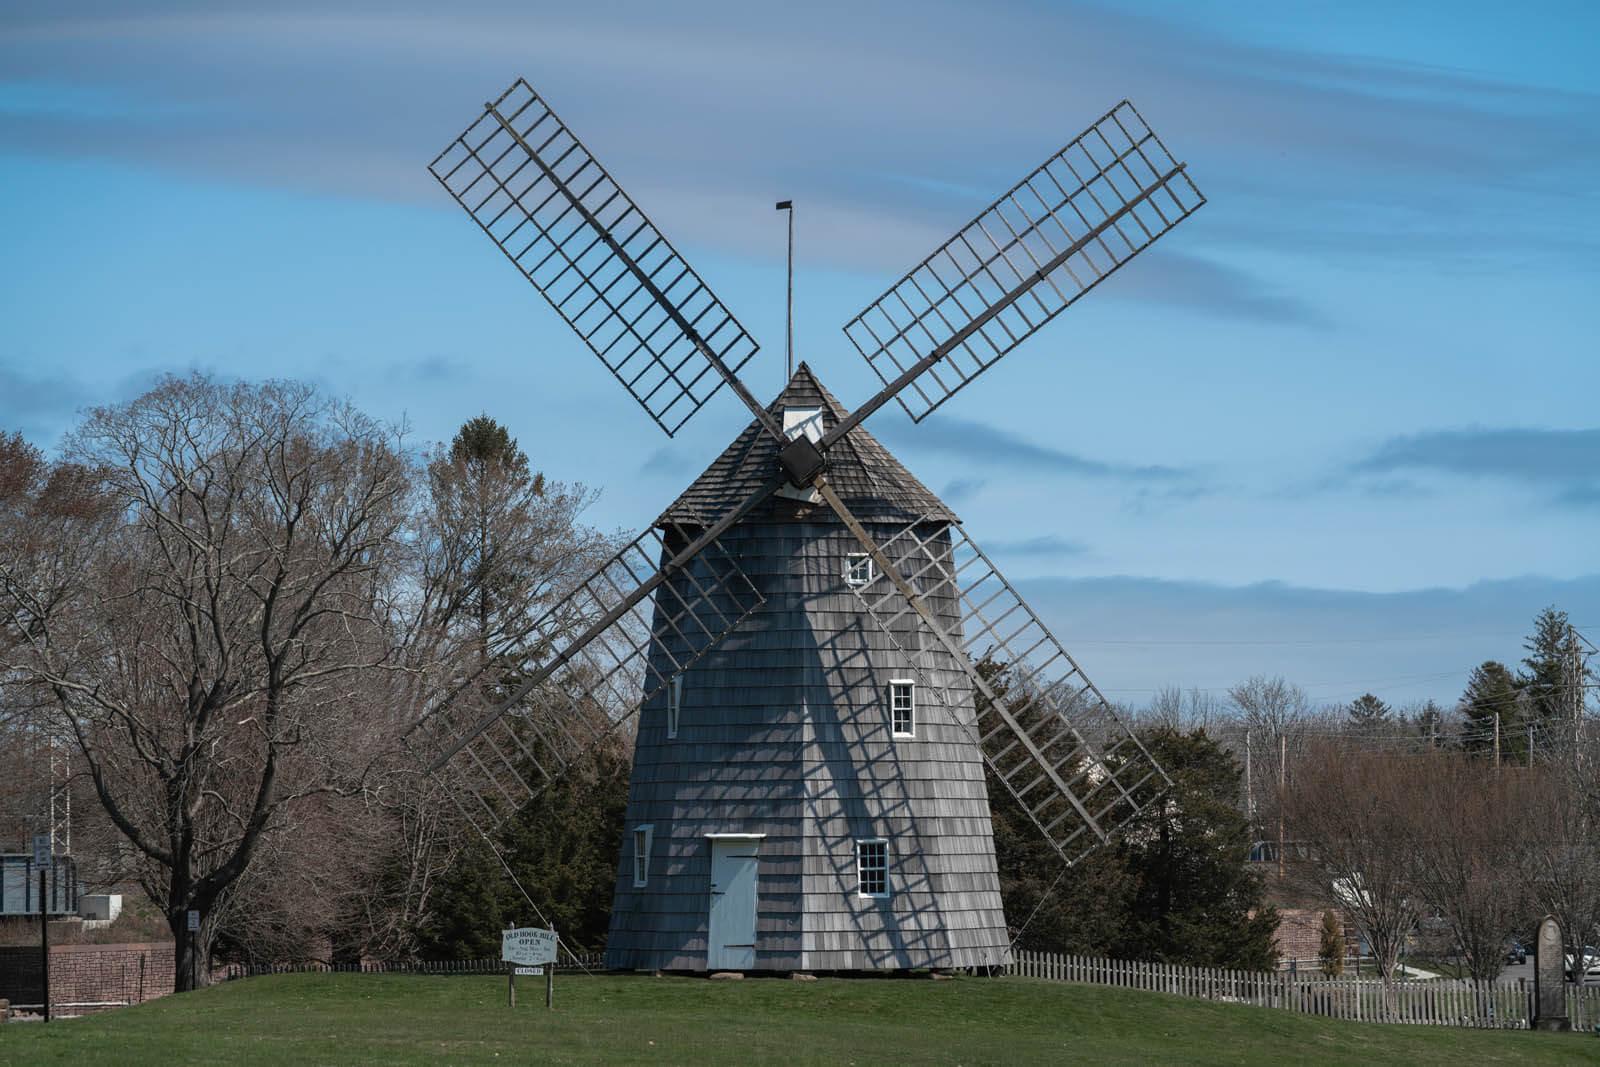 East Hampton windmill in the Hamptons New York